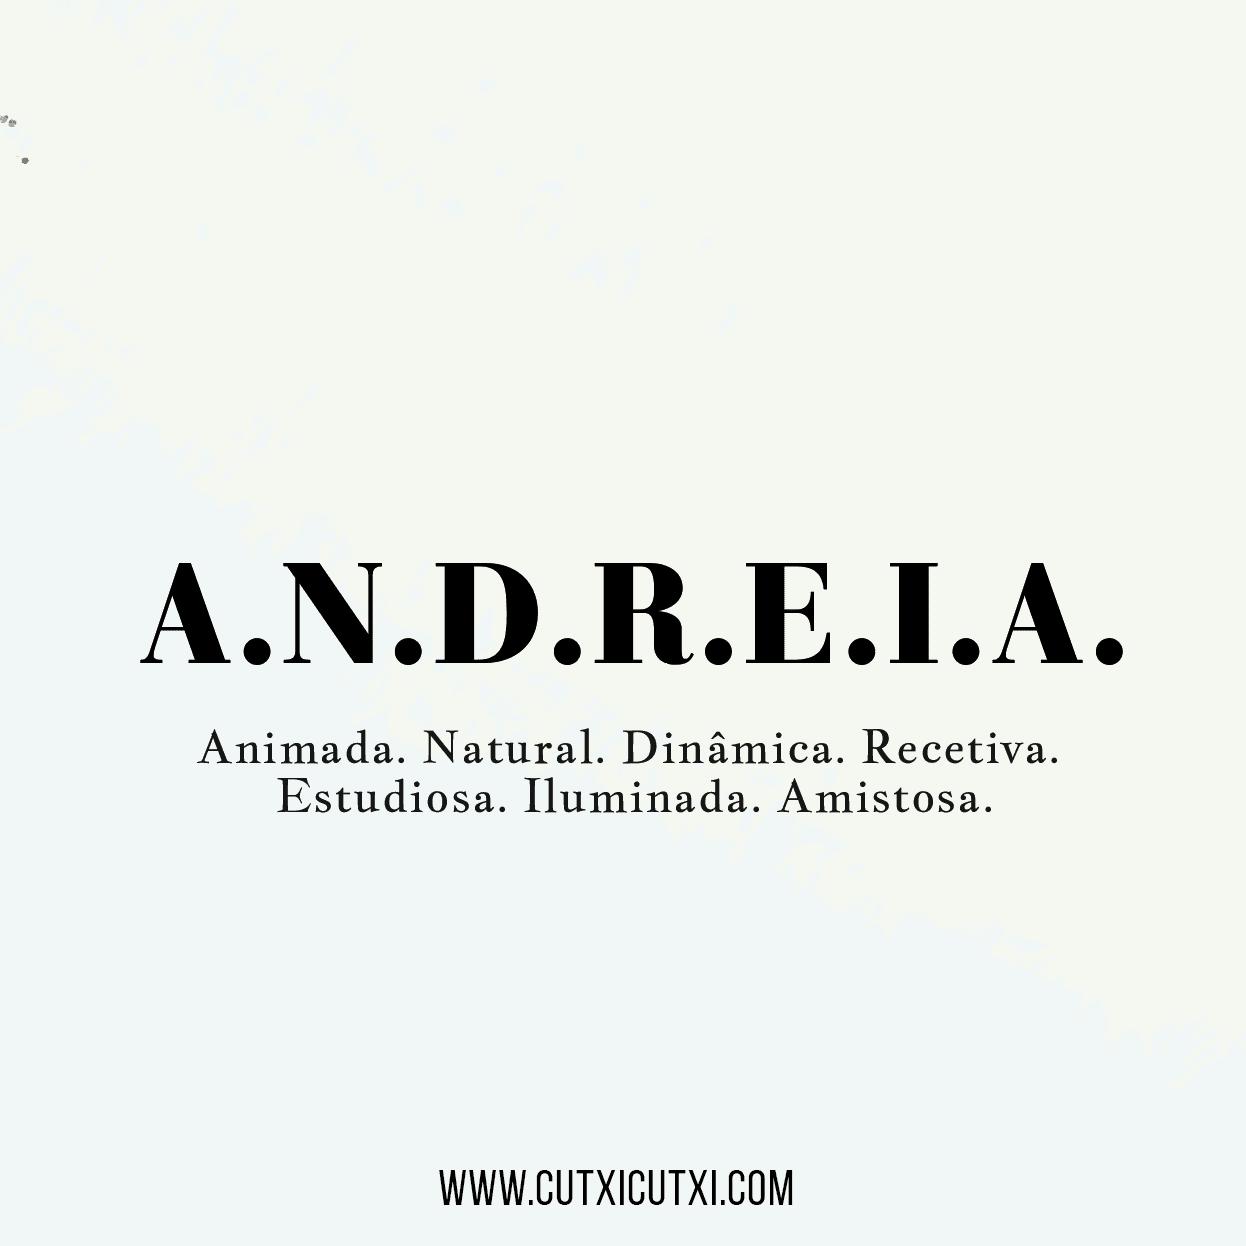 Andreia siginificado nome cutxi